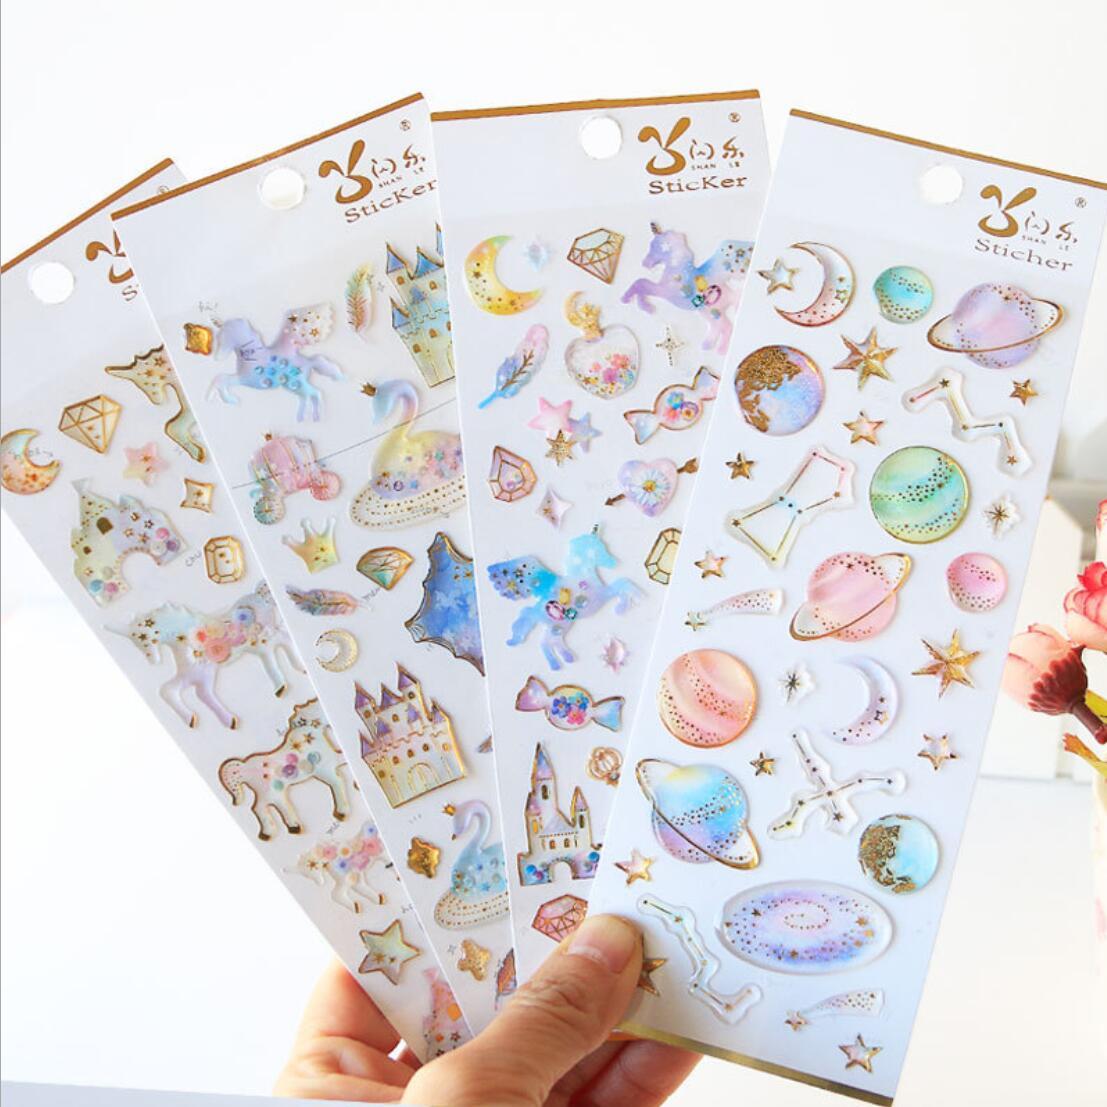 Kawaii Unicorn Castle Space Planet Crystal Stickers Scrapbooking Diy Bullet Journal Diary Stationery Sticker Korean Cute